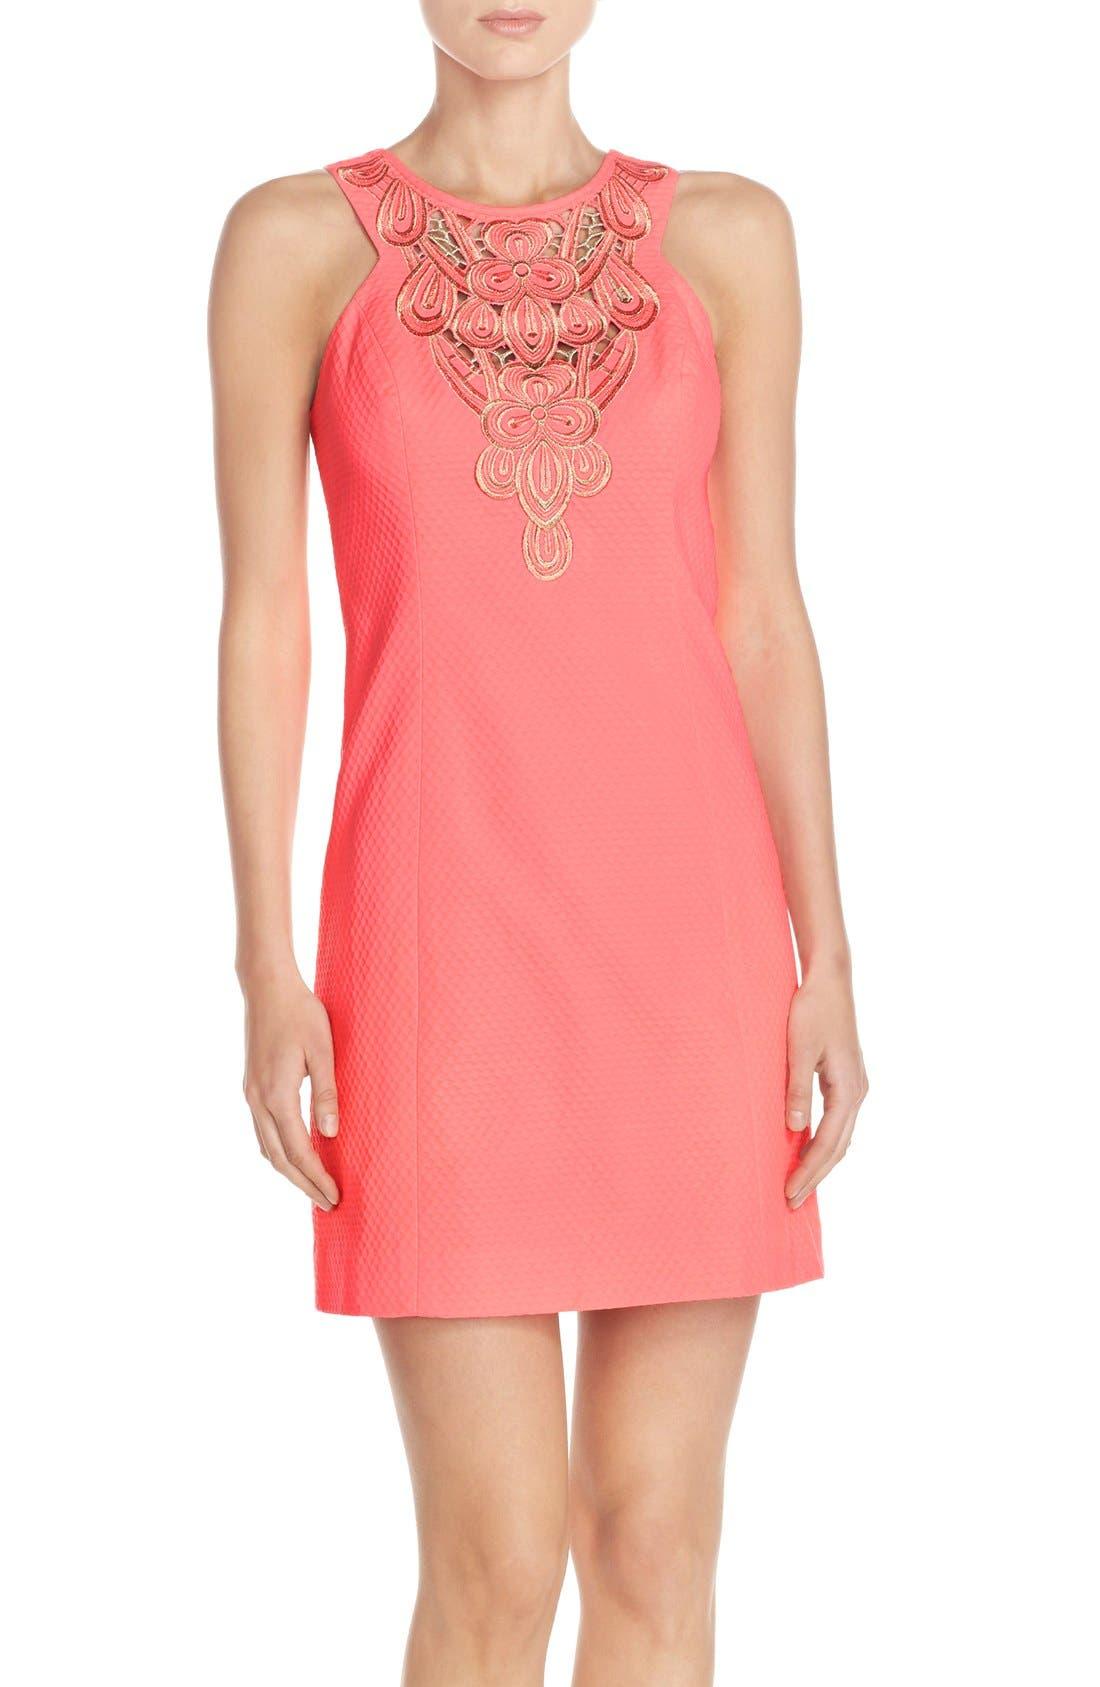 Main Image - Lilly Pulitzer® 'Largo' Cotton Piqué Sheath Dress